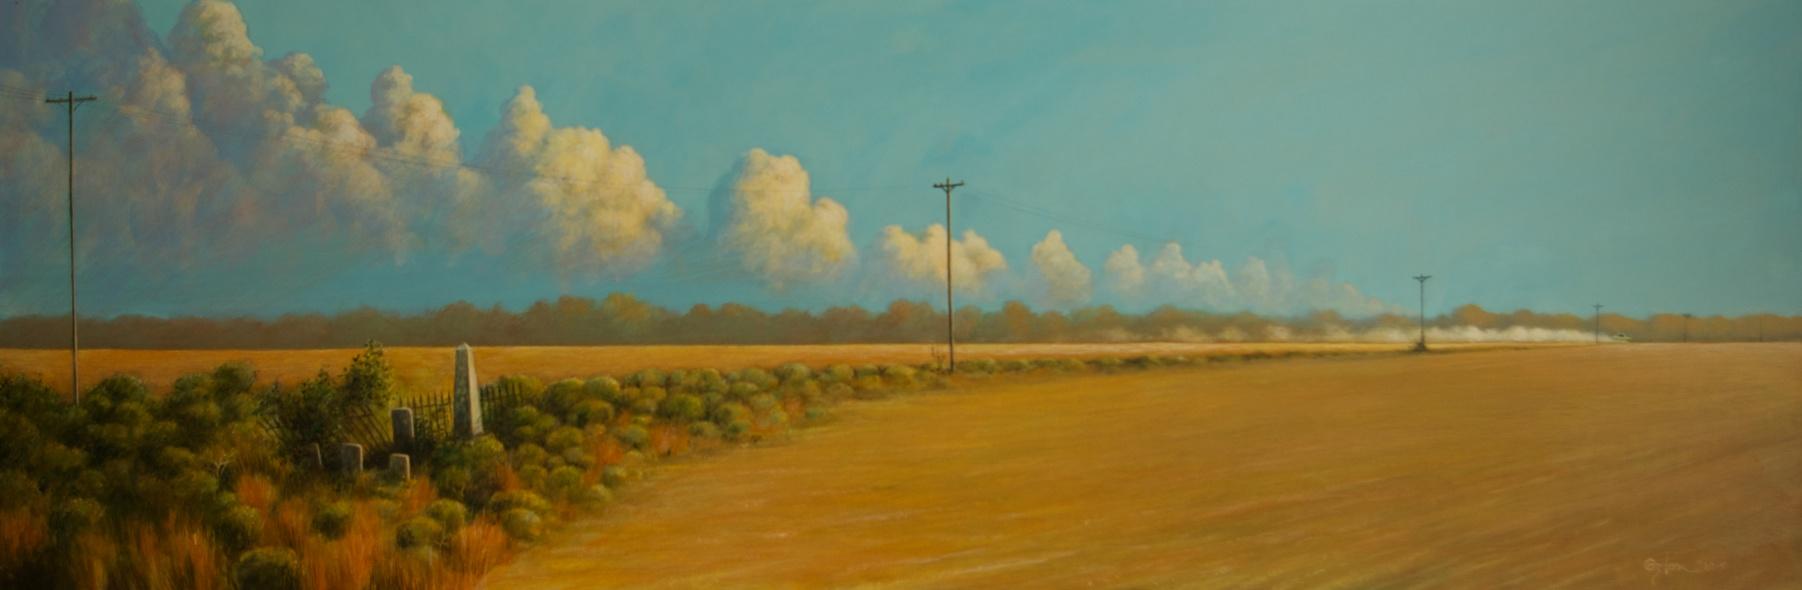 Daniel Coston, Arkansas artist